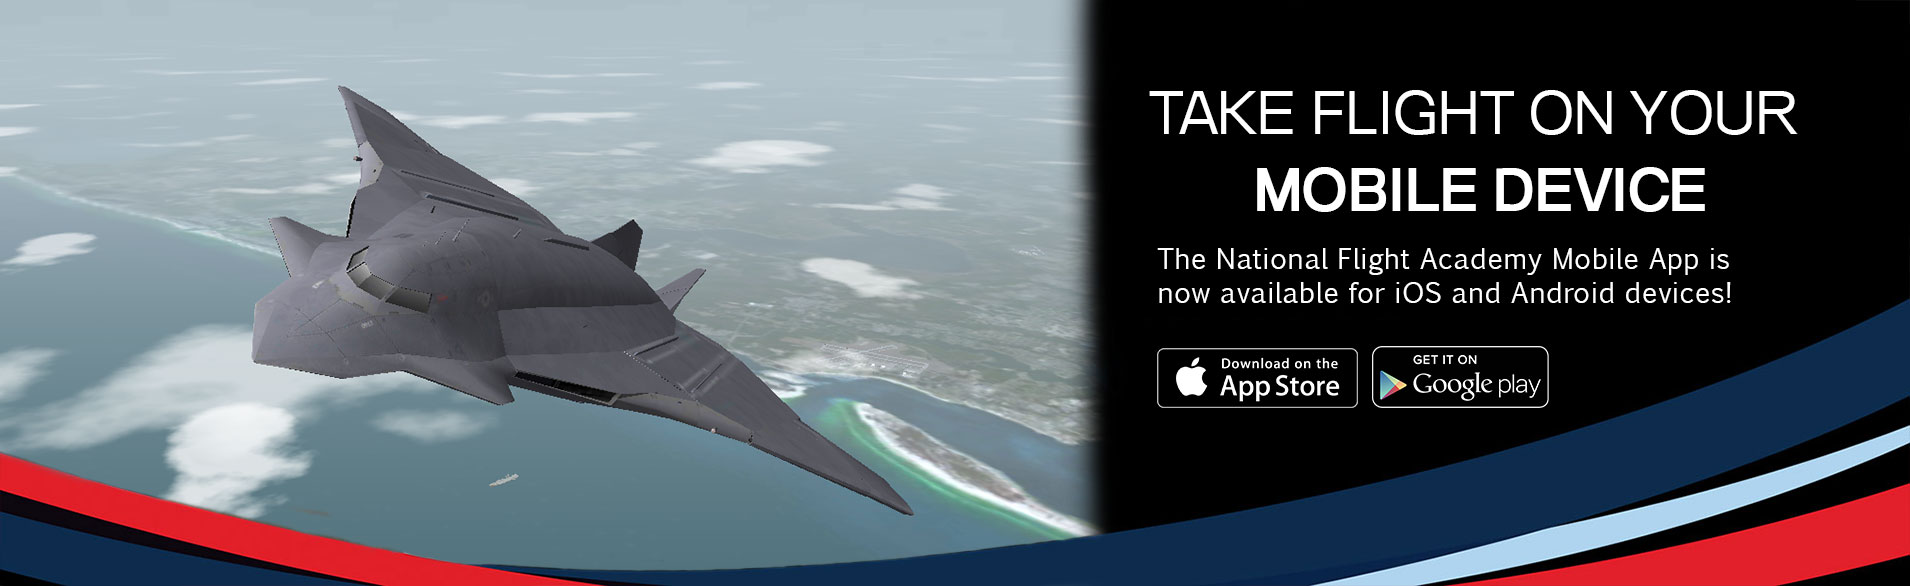 NFA Mobile App